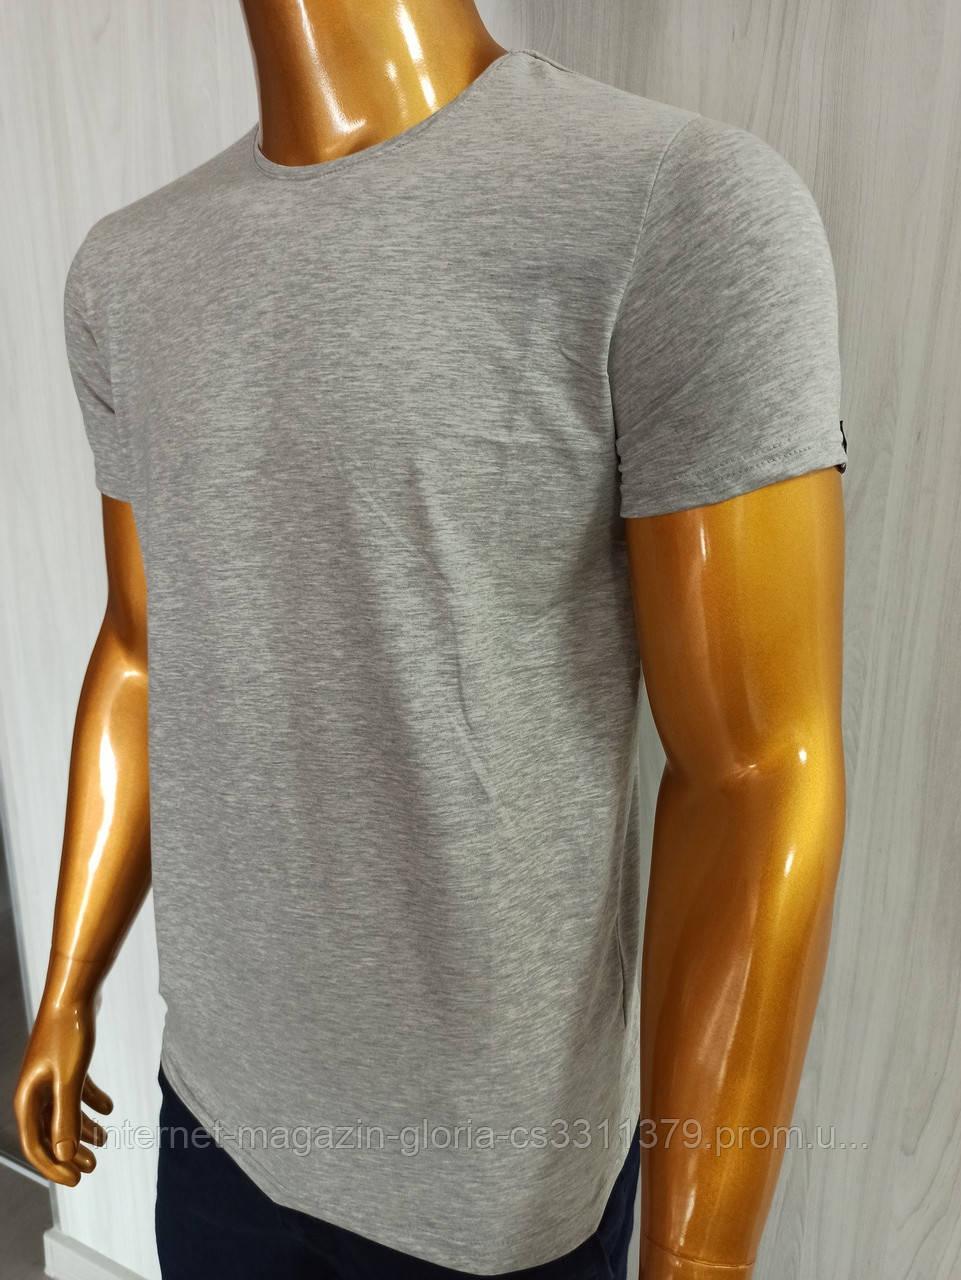 Мужская футболка MSY. 42636-8182(grey). Размеры: M,L,XL,XXL.